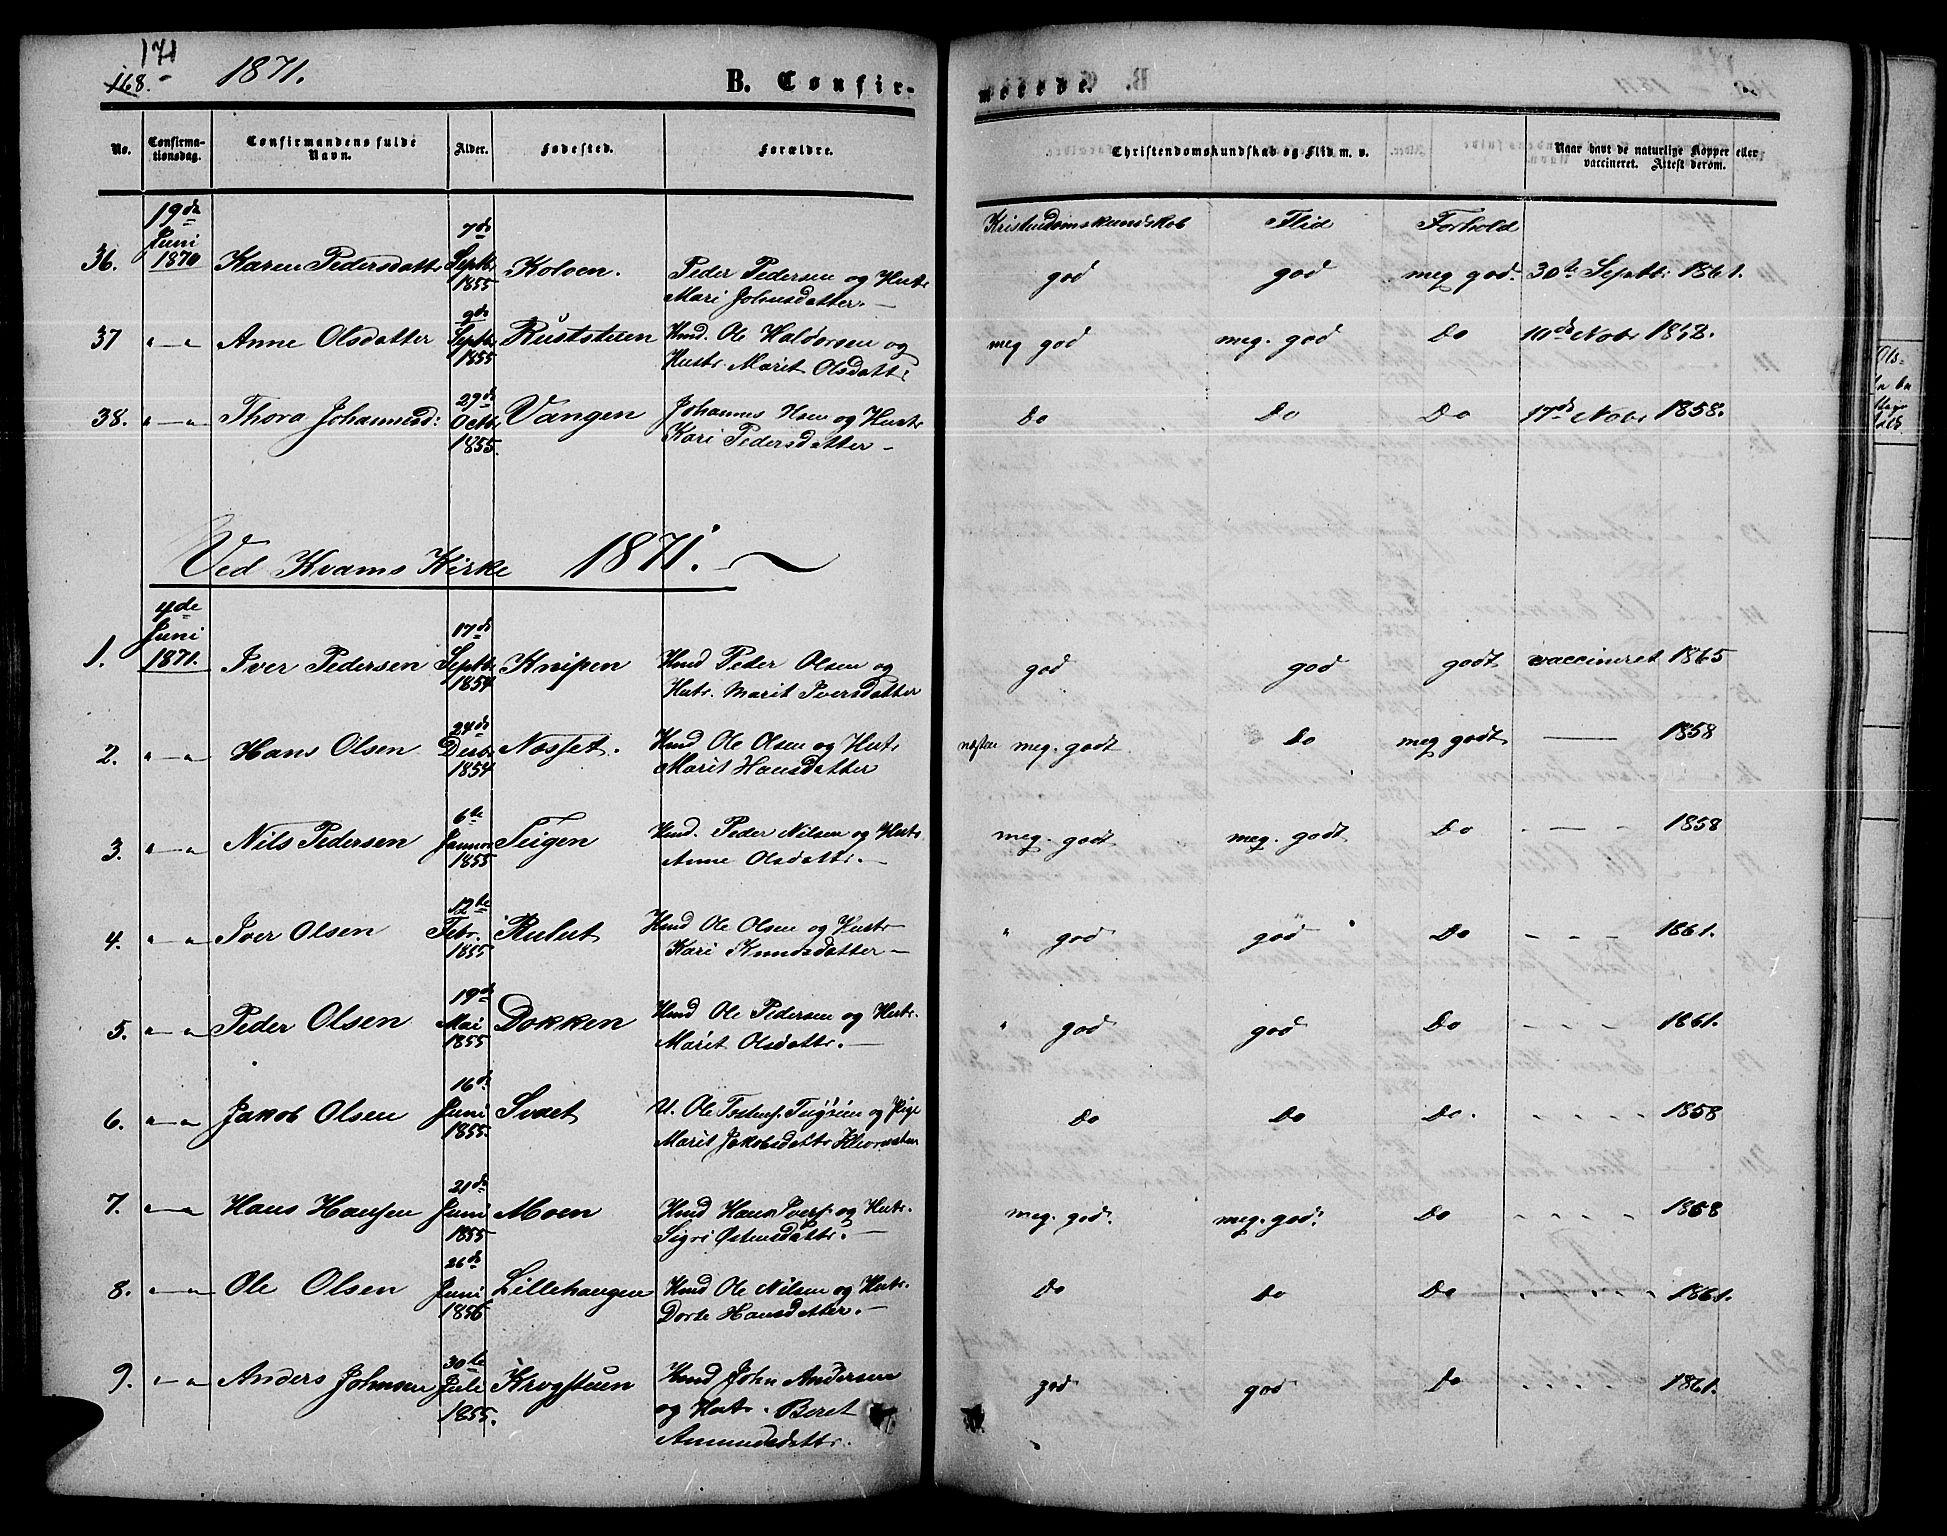 SAH, Nord-Fron prestekontor, Klokkerbok nr. 3, 1851-1886, s. 171